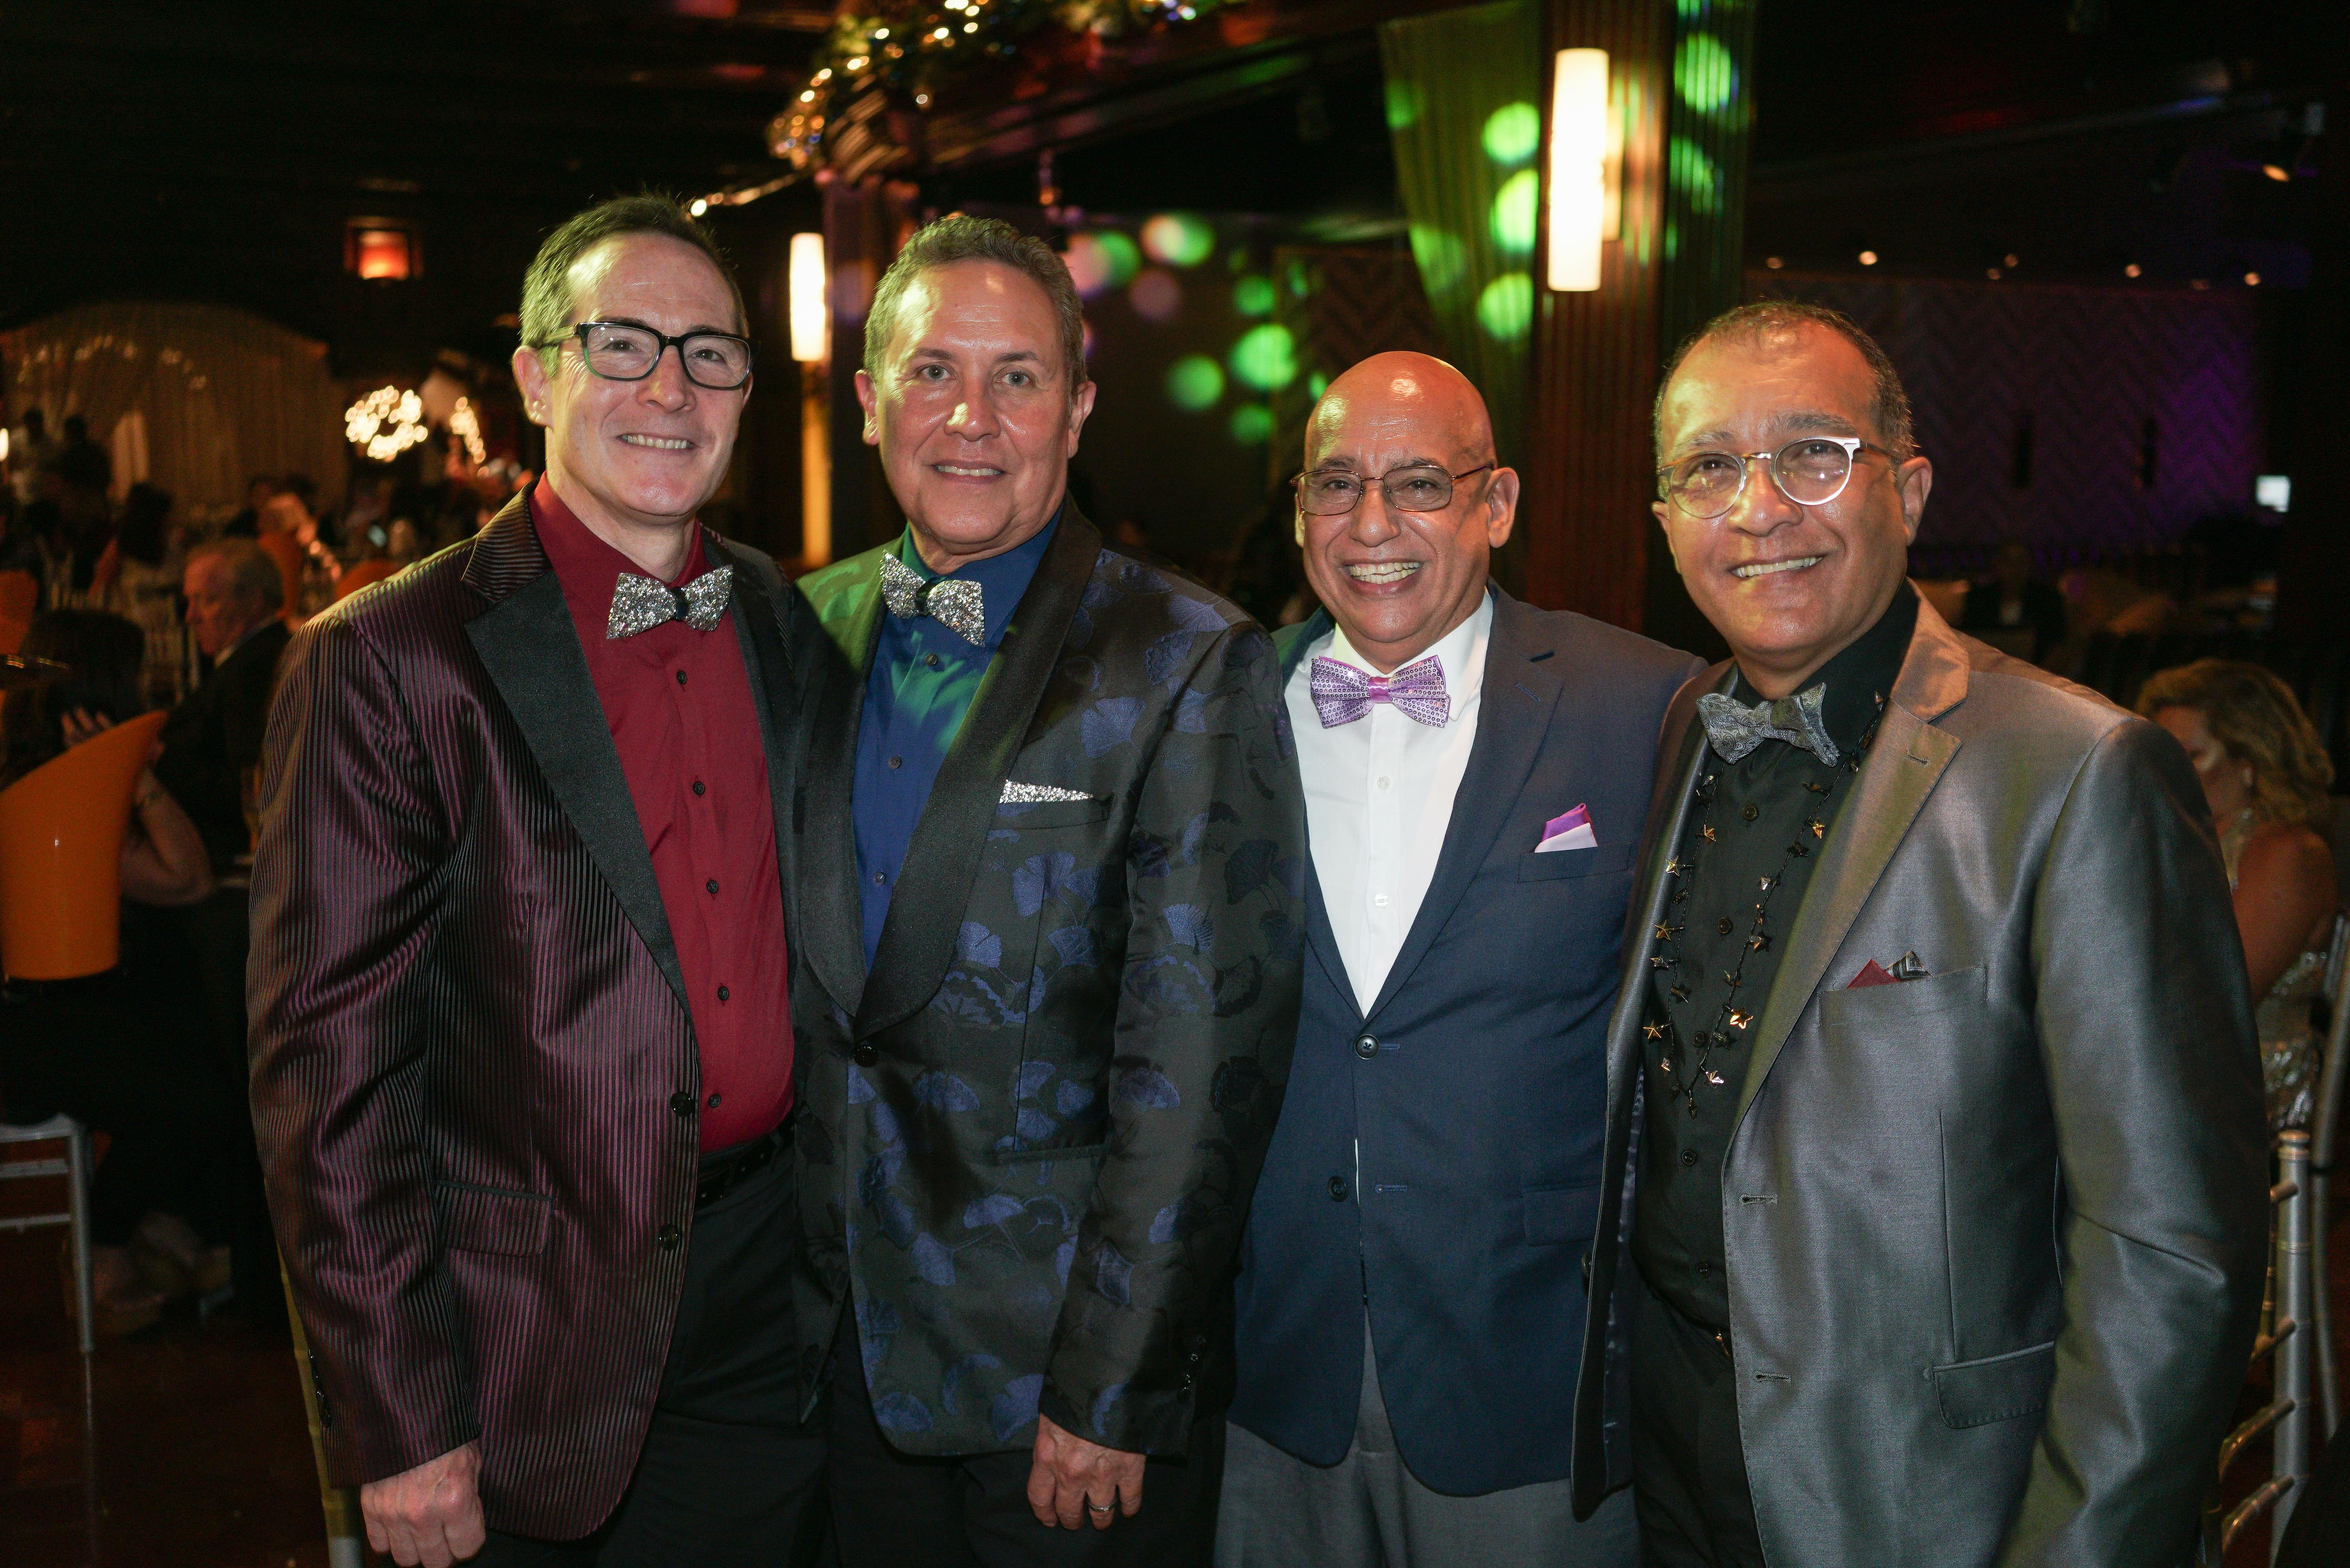 Ken O'Brien, Jaime Huertas, John Stephen Ginorio y Abraham Rivera. (Suministrada)